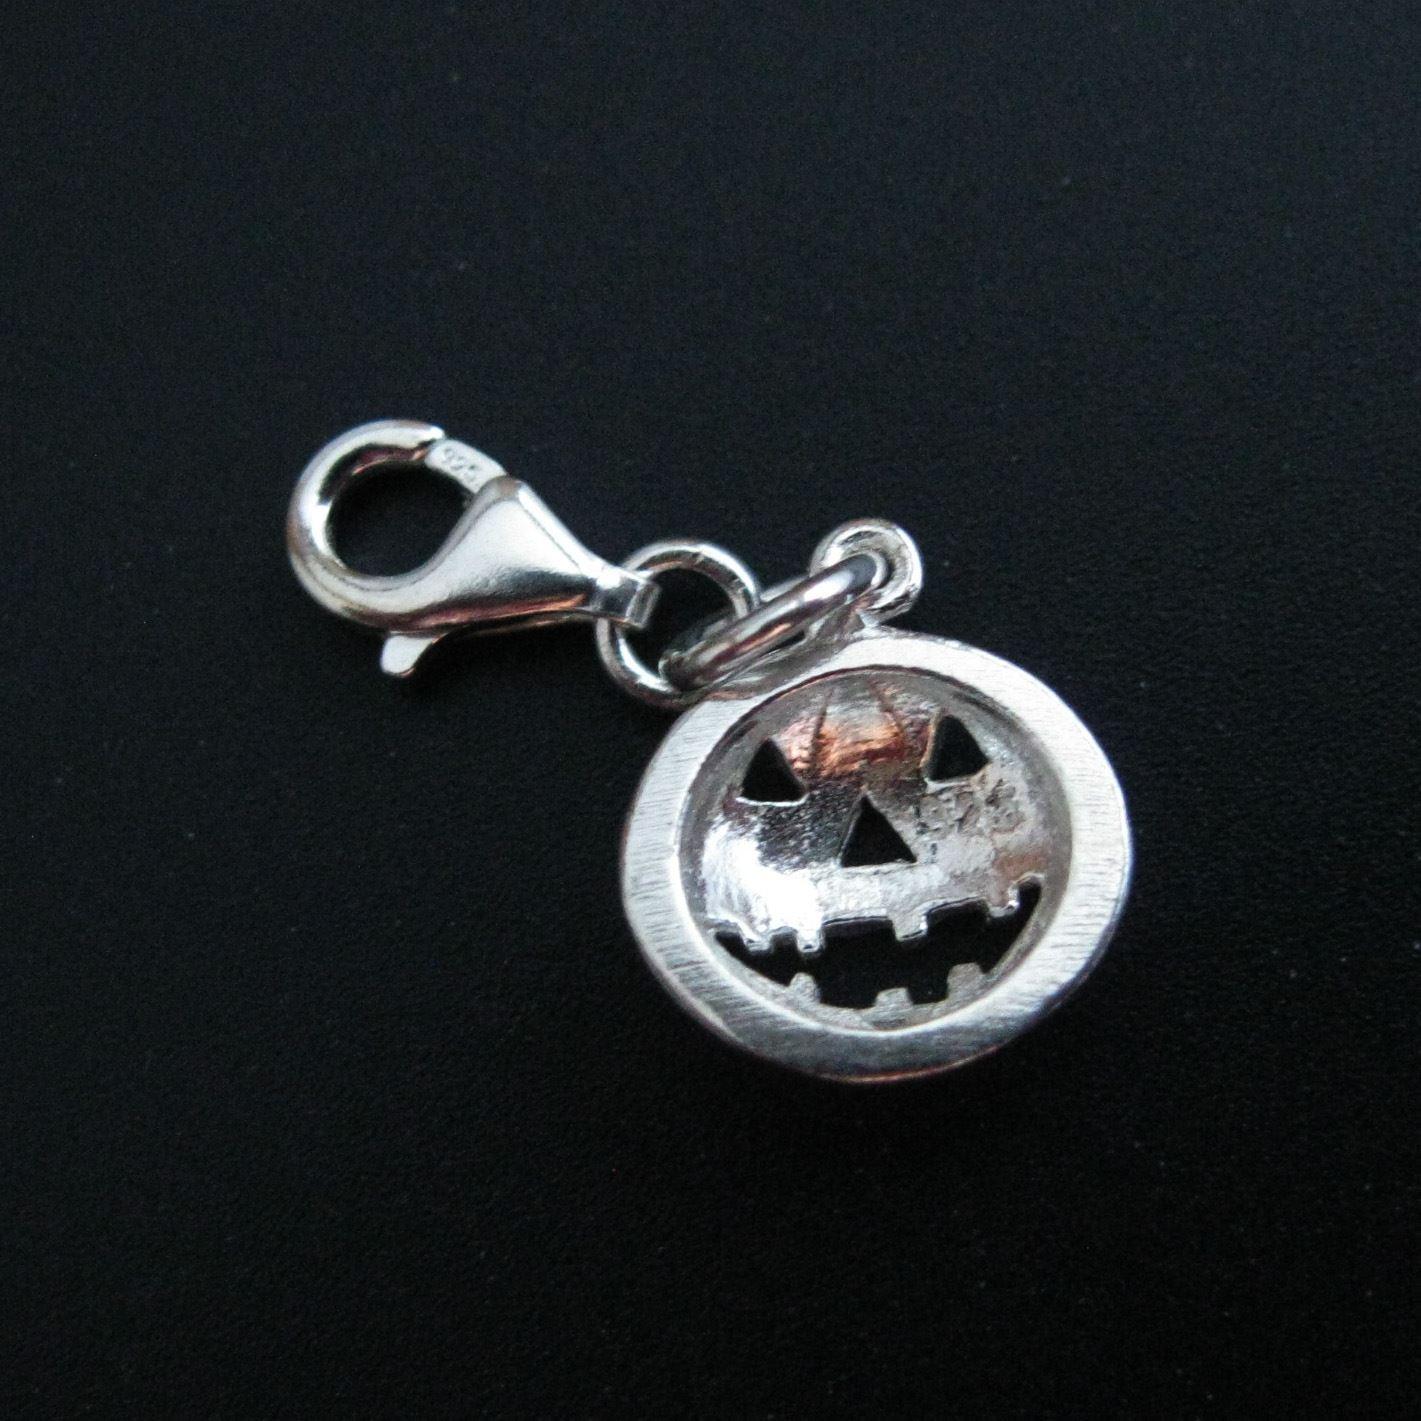 Sterling Silver Pumpkin Charm - Charm with Clasp - Charm Bracelet Charm- Add on Charm